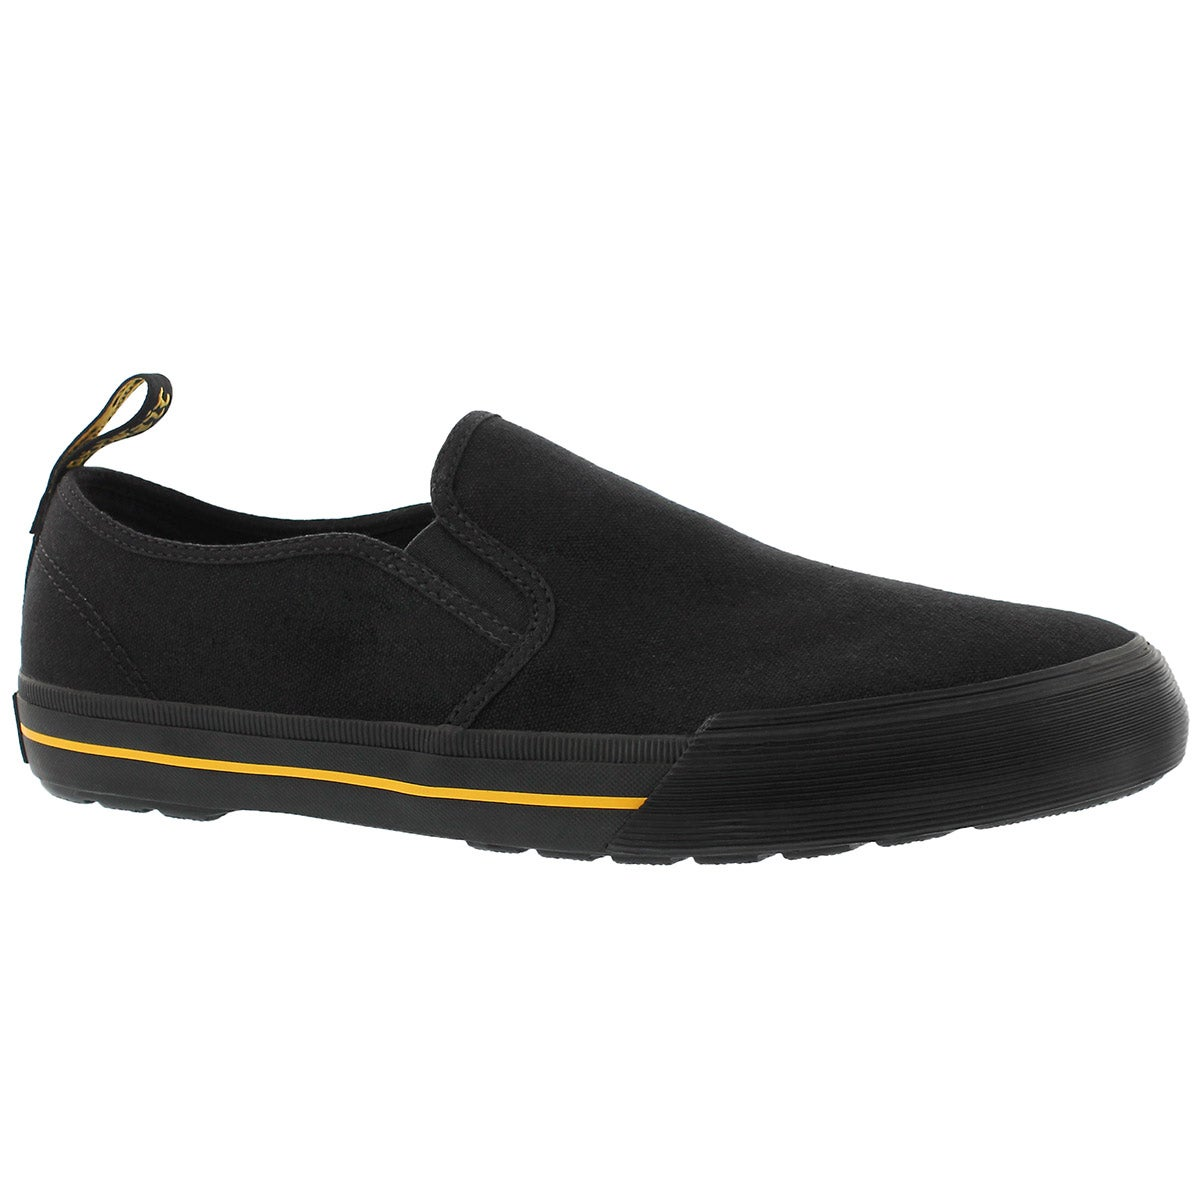 Men's TOOMEY black slip on shoes